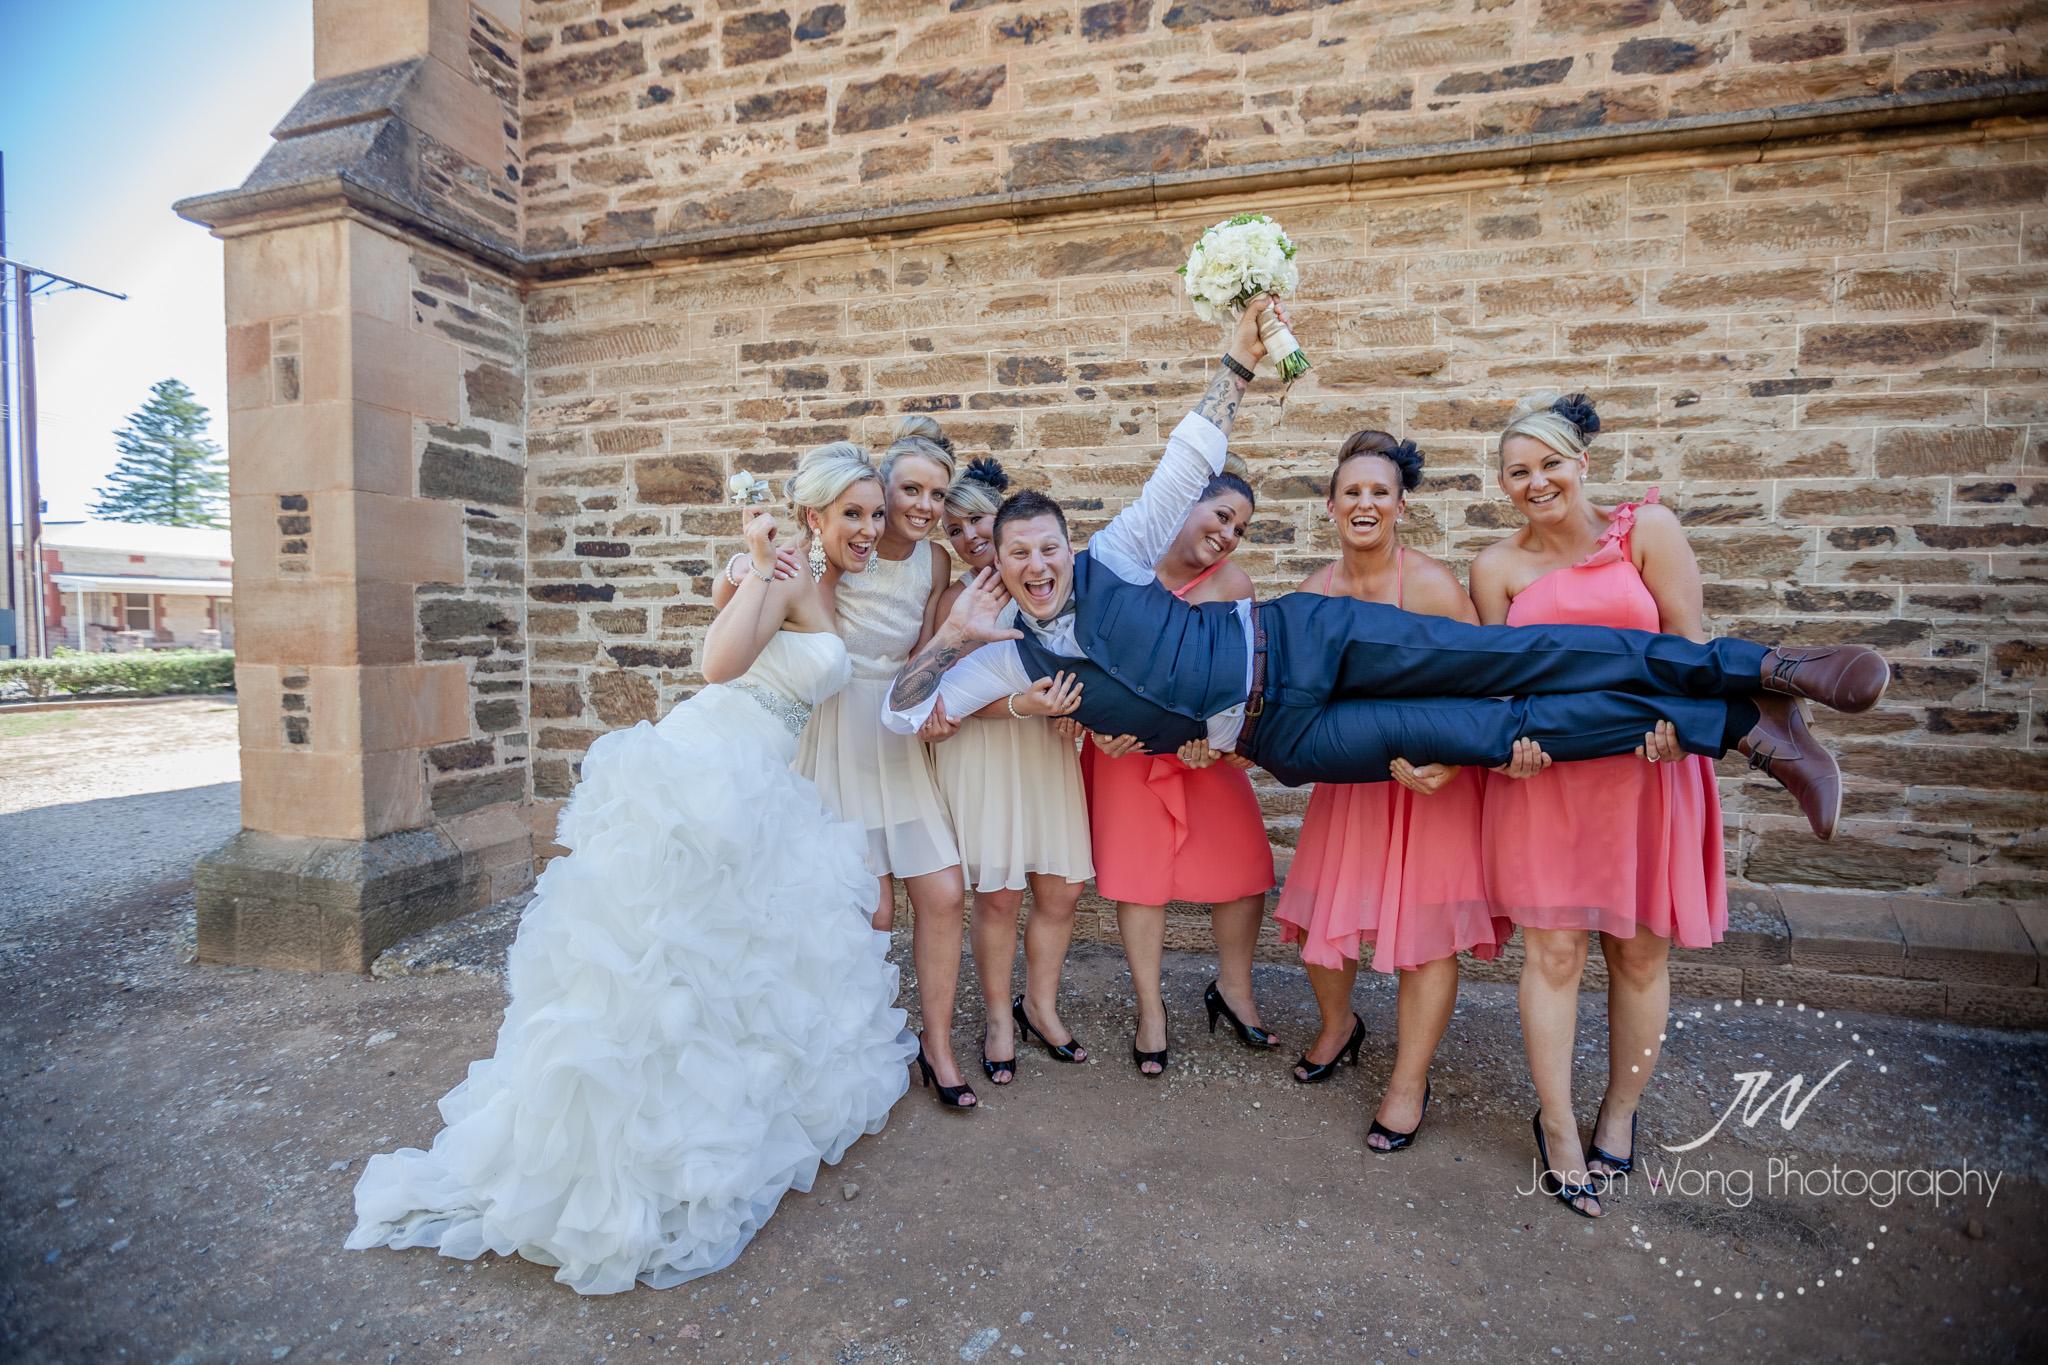 fun-bridal-party-shoot.jpg